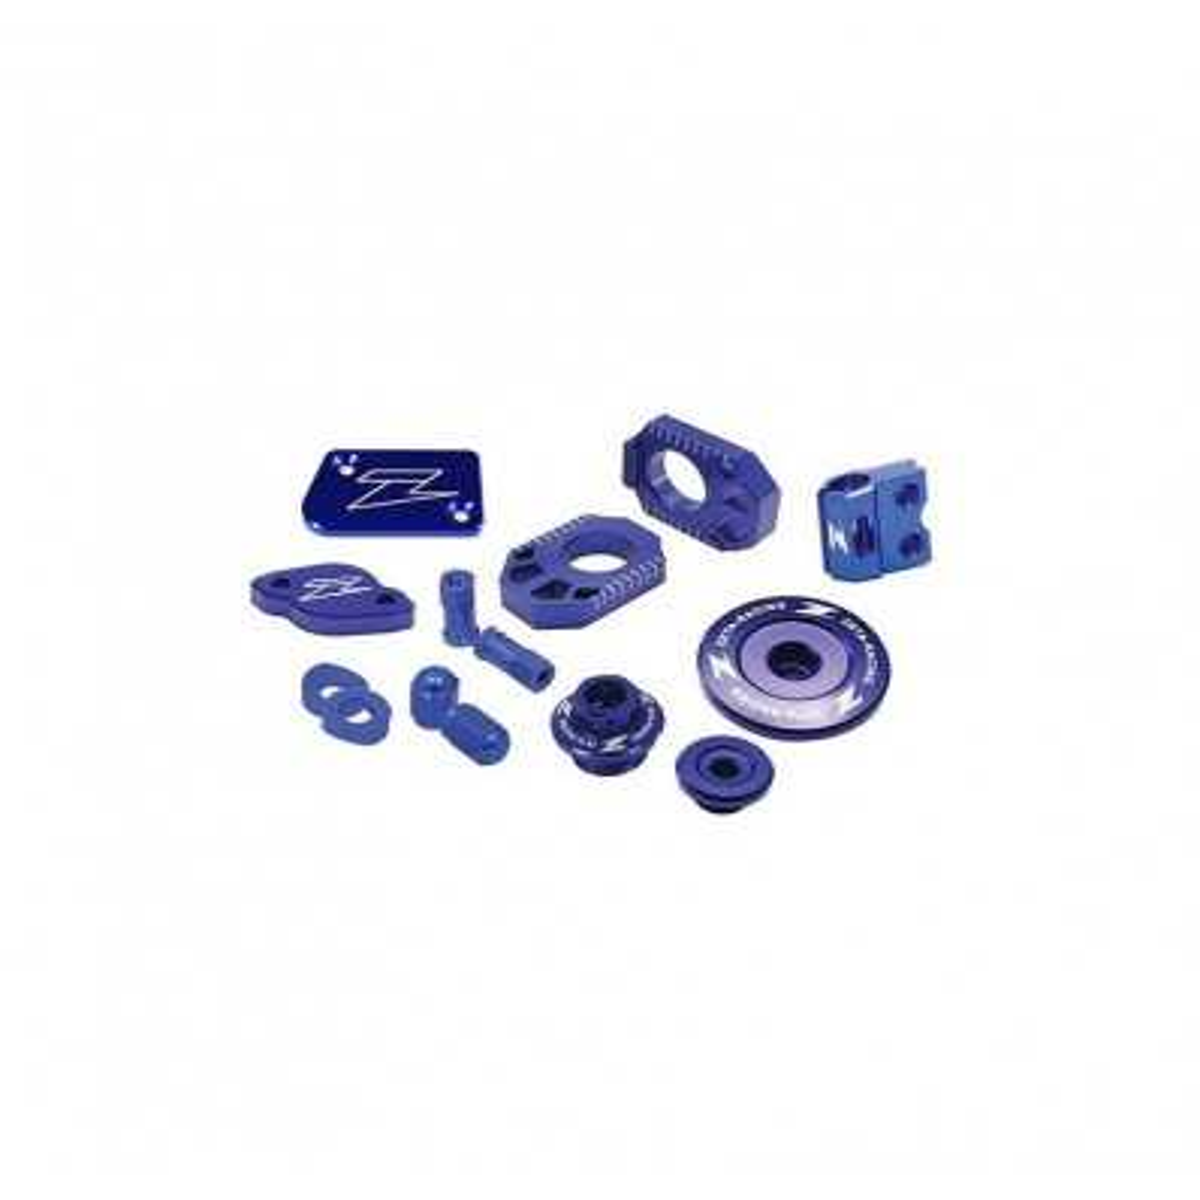 ZE51.2556 - Kit Completo Husqvarna Tc125,Fc250-450 ´16 Azul